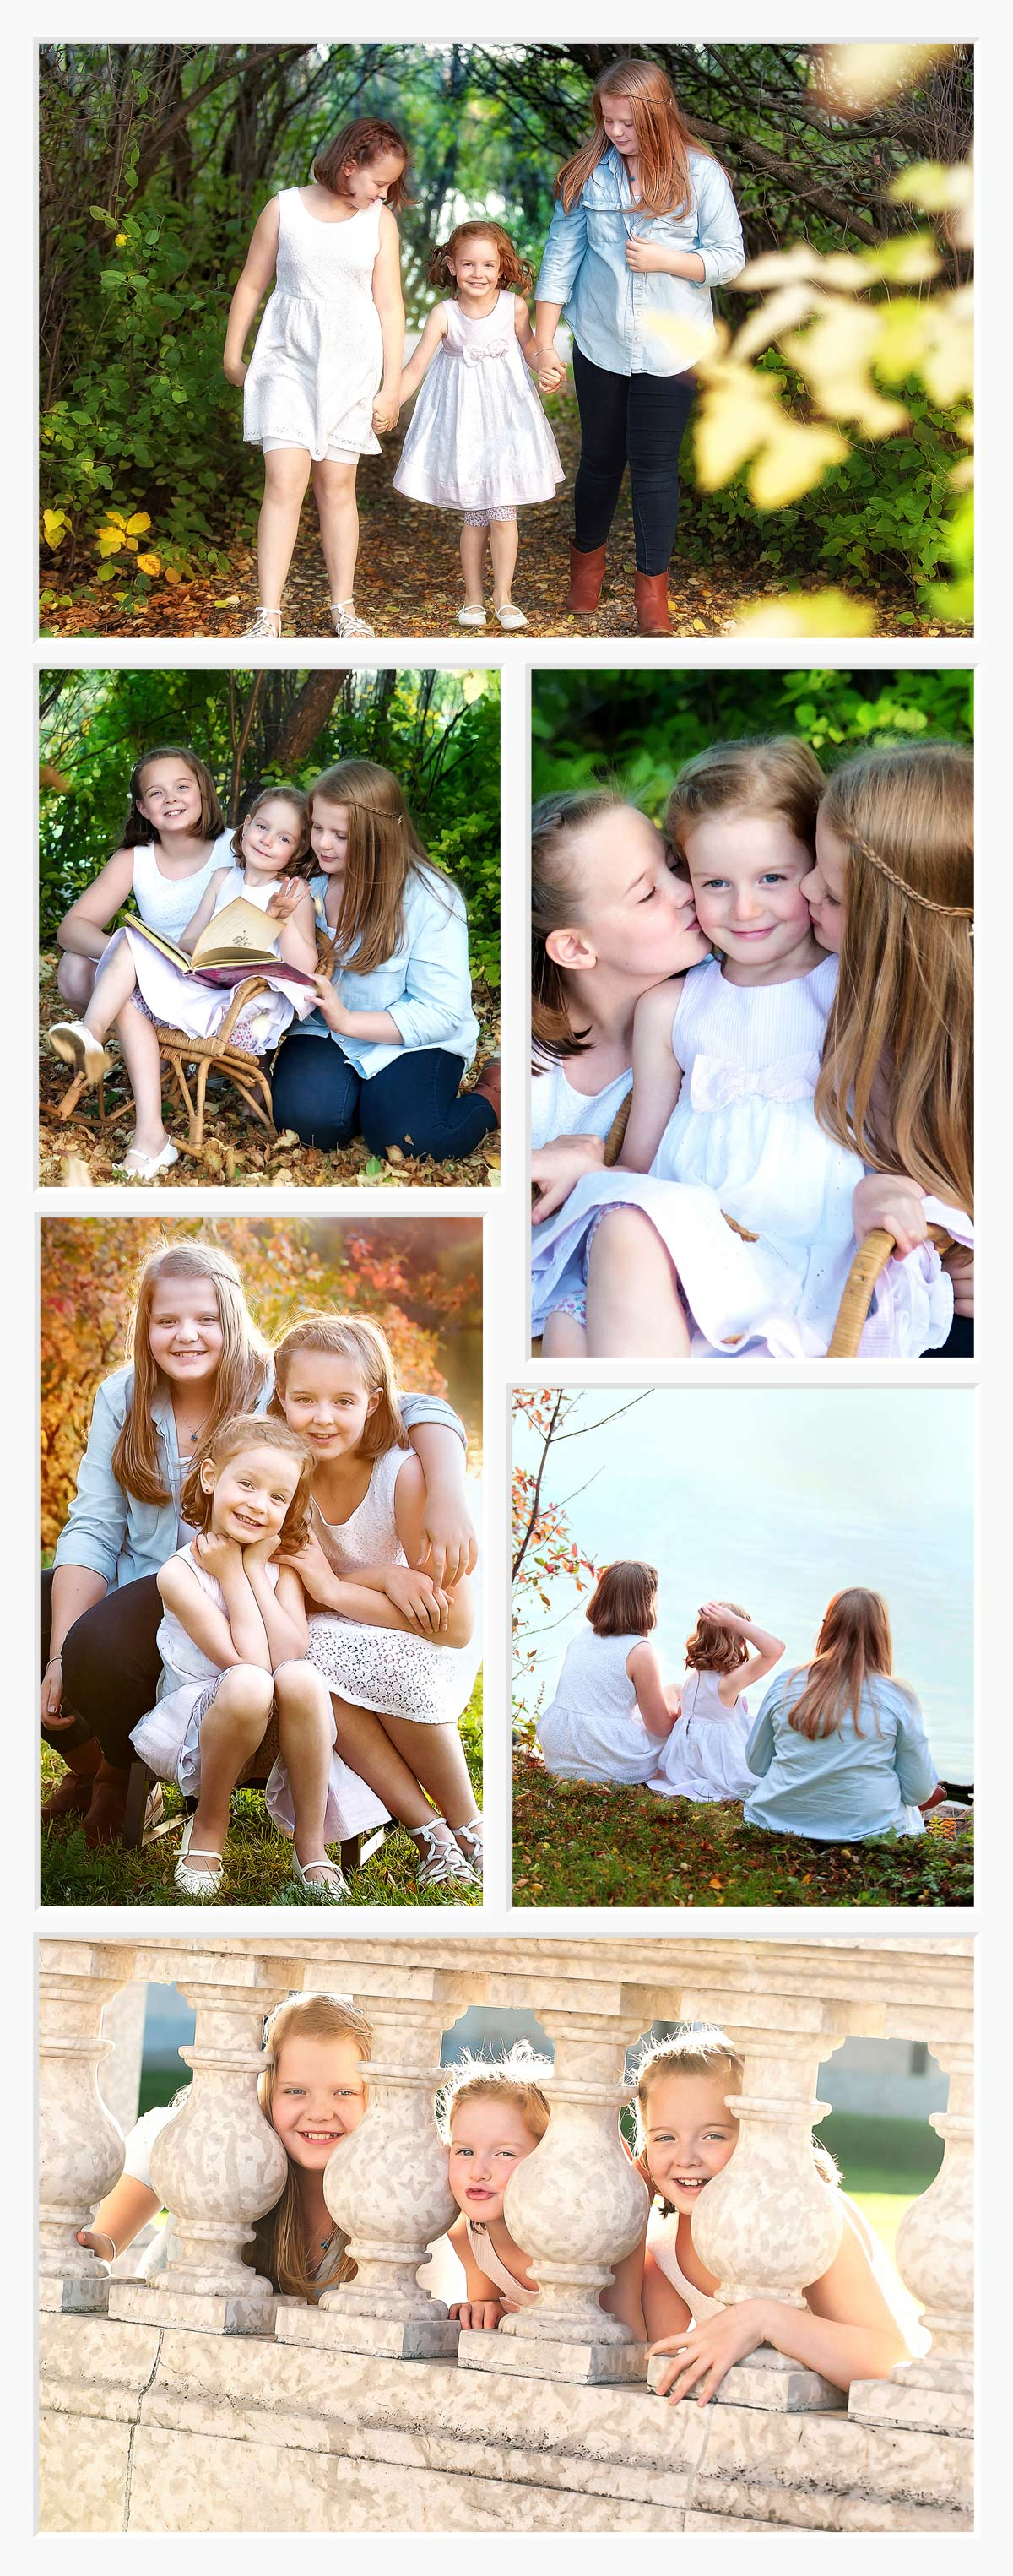 regina-children-photographer-free-lense-photo.jpg